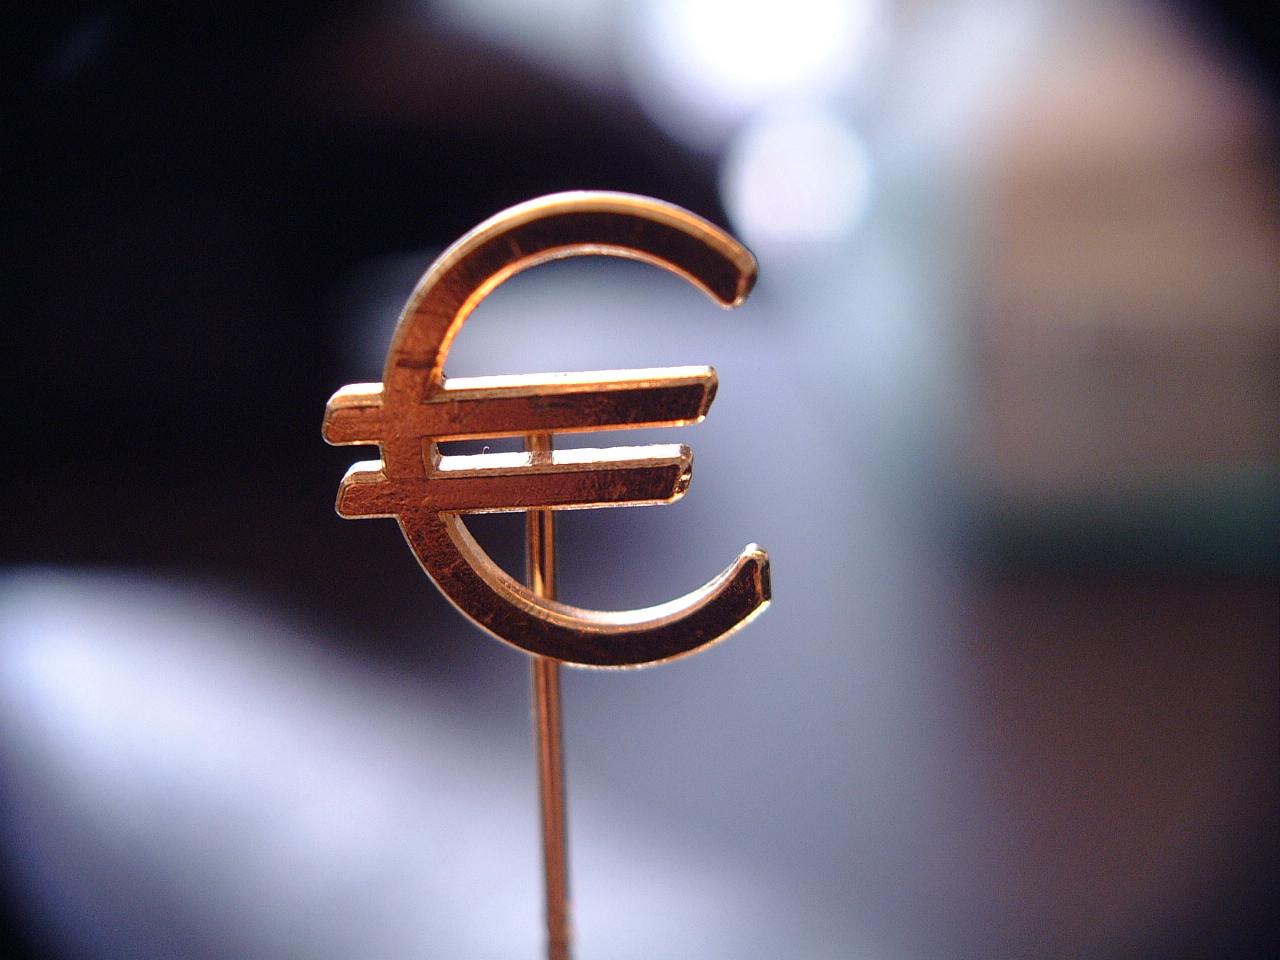 maartent pin scripts euro sign sanserif copper gold money value